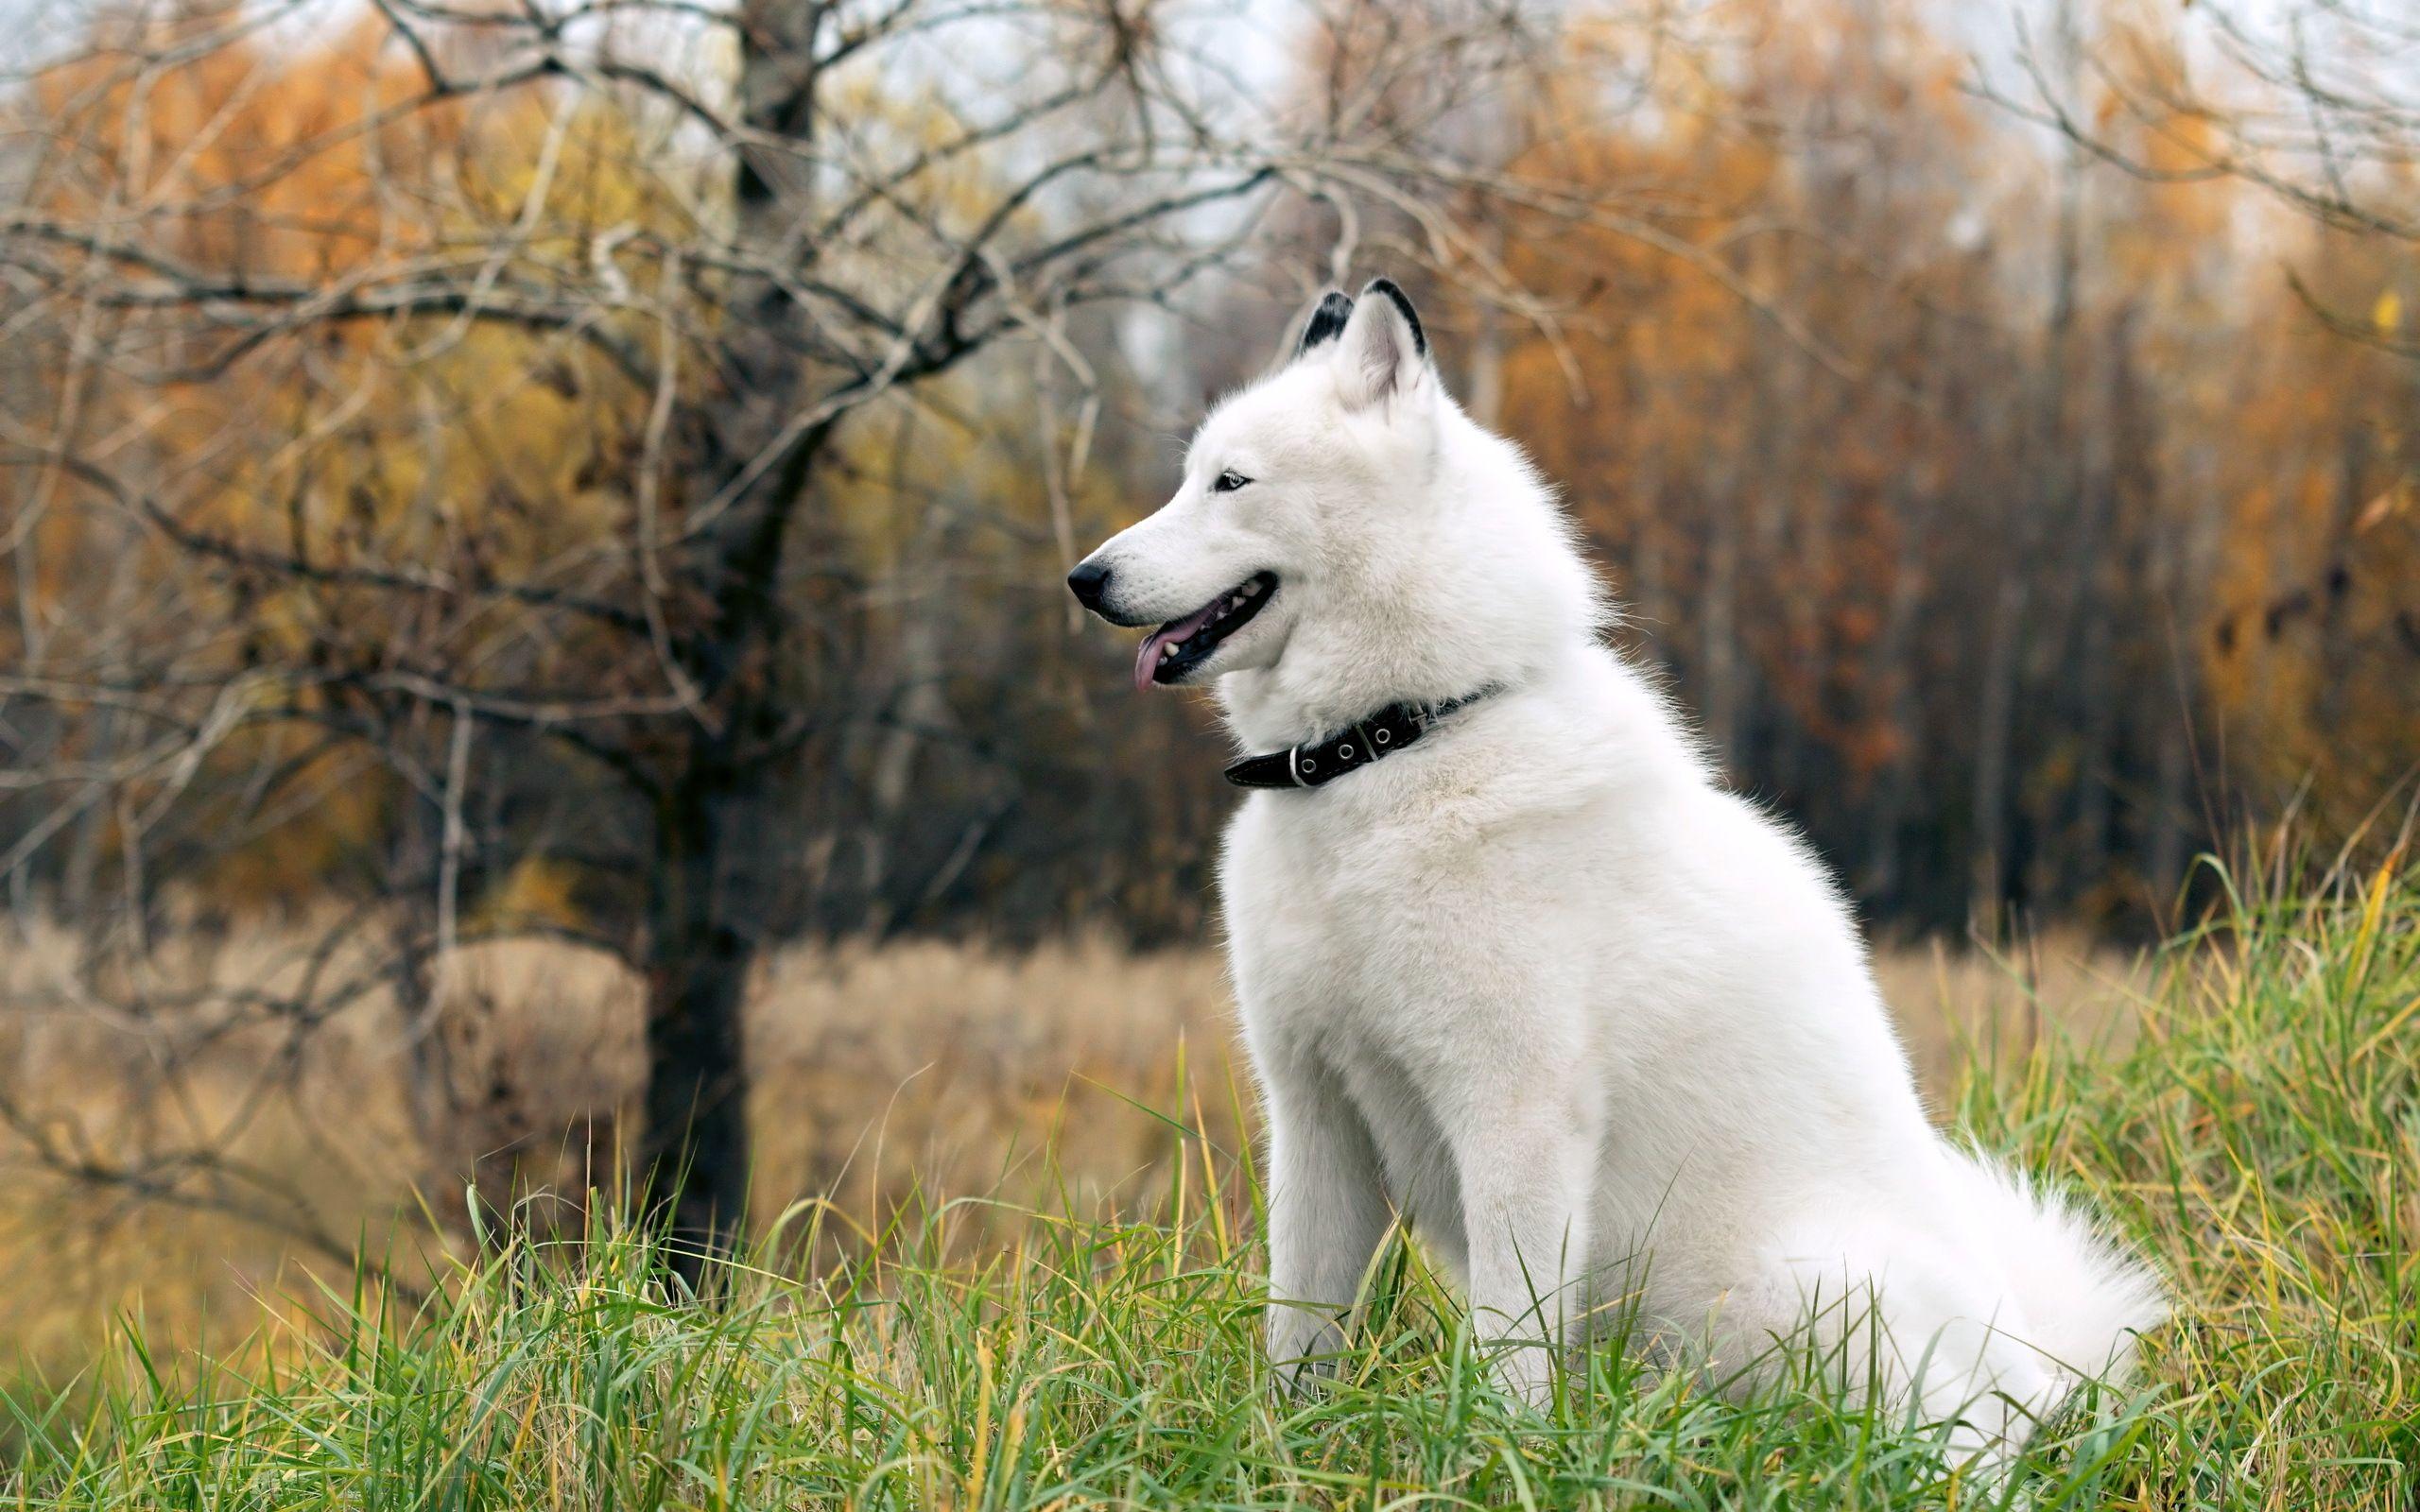 Hd wallpaper dog - White Husky Dog